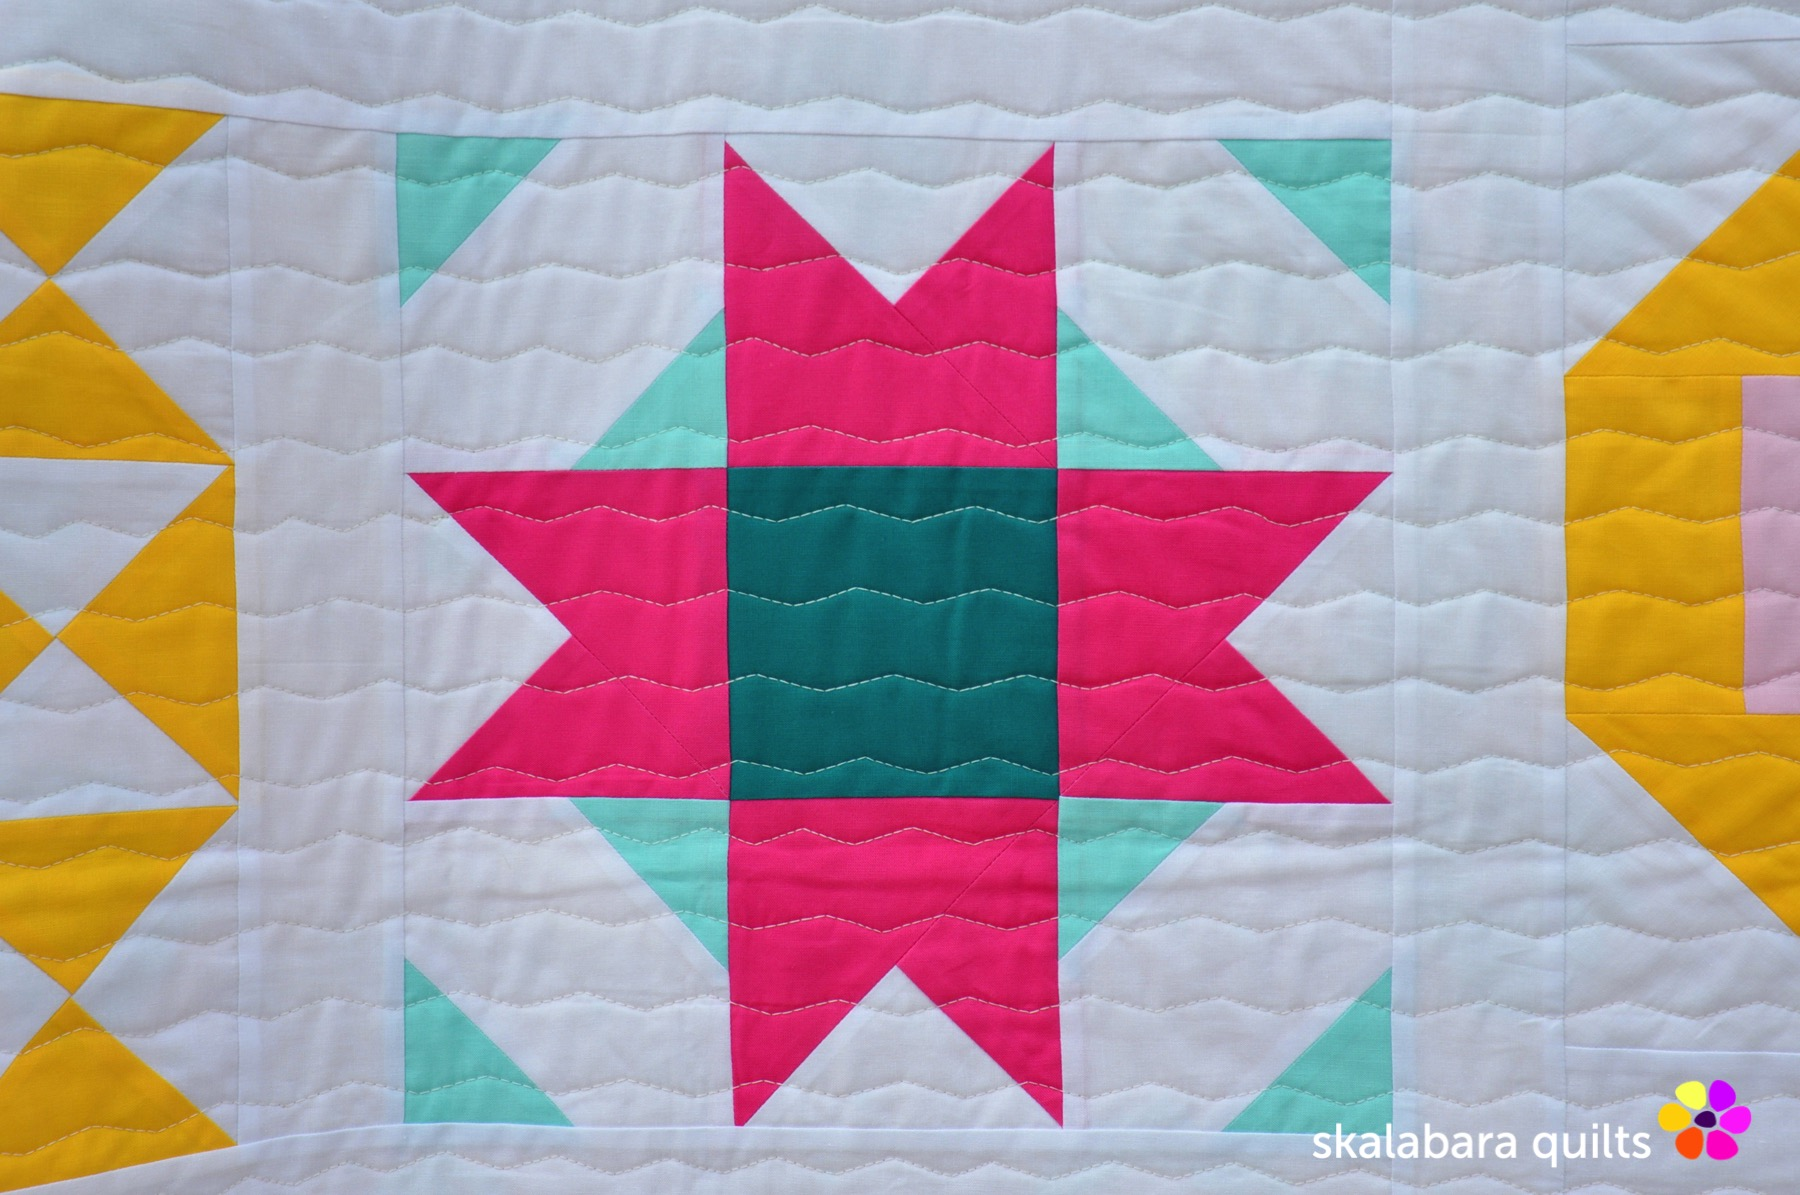 modern sampler detail 3 - skalabara quilts